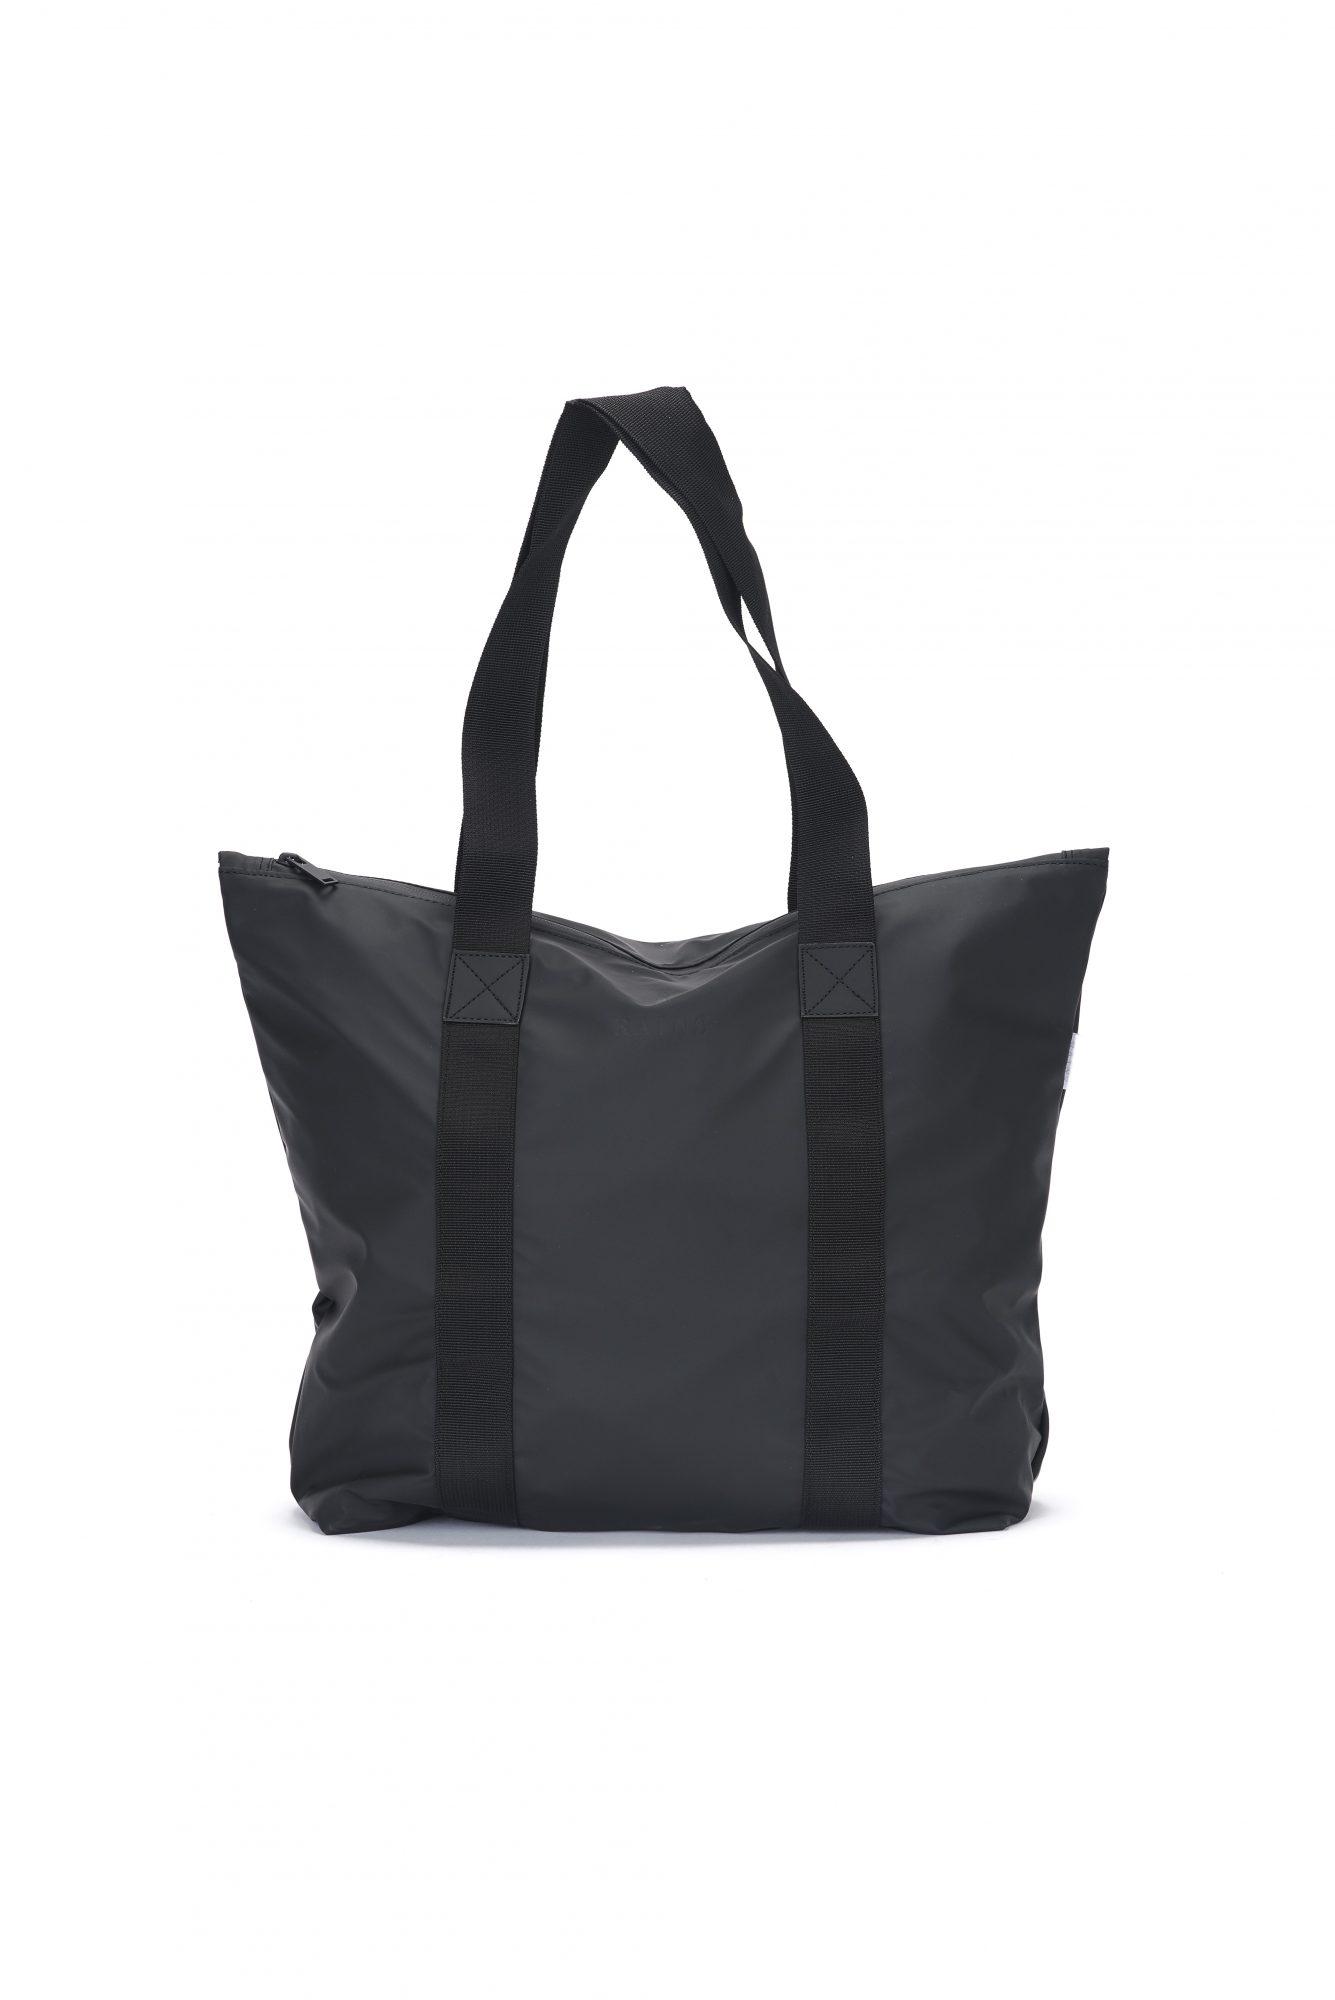 RAINS-Tote-Bag-Rush-1